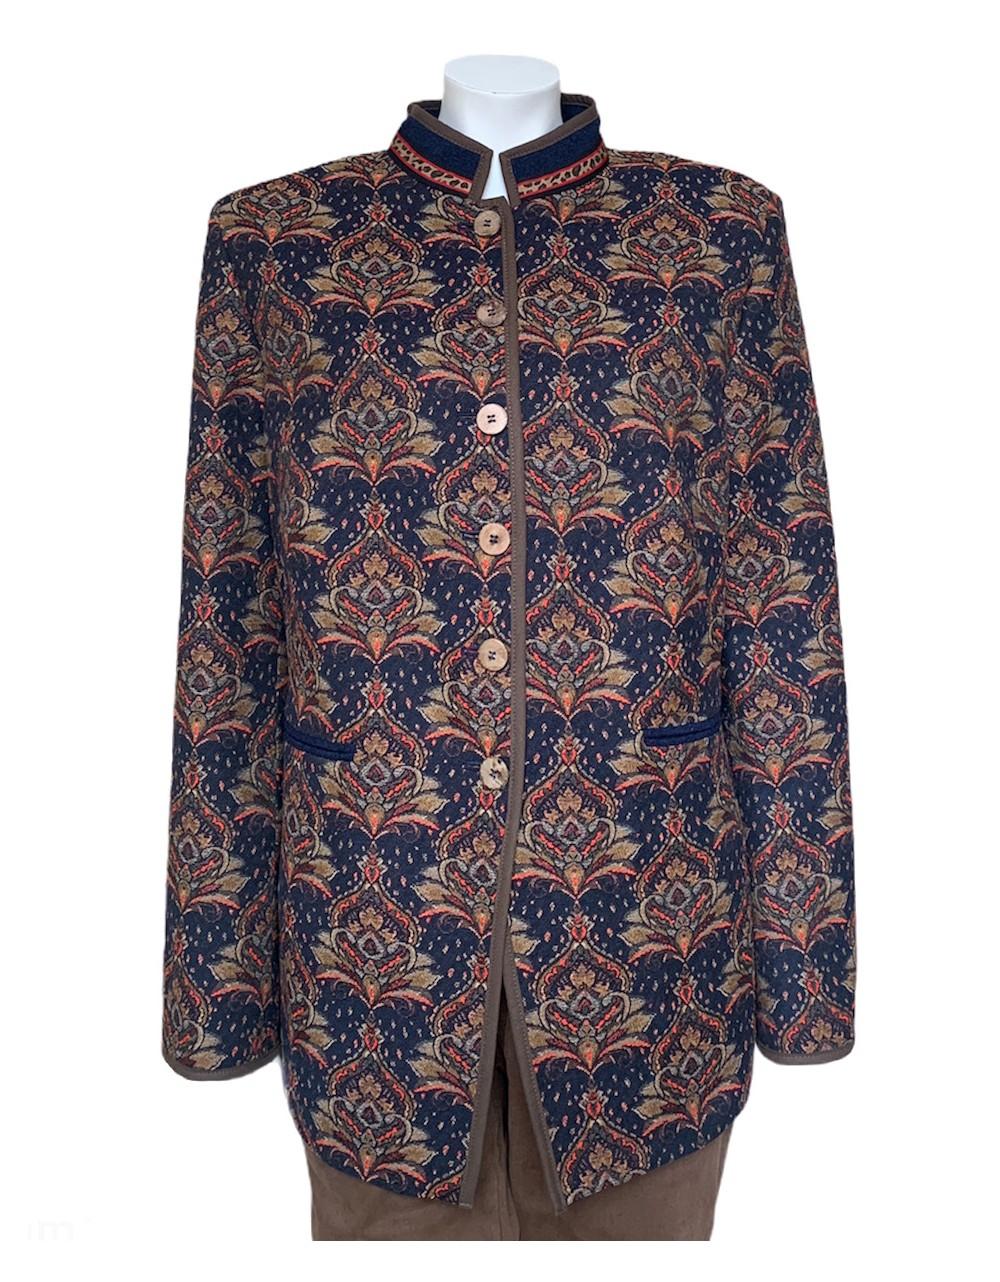 Rofa Moden Tapestry Design Jacket Irish Handcrafts 1